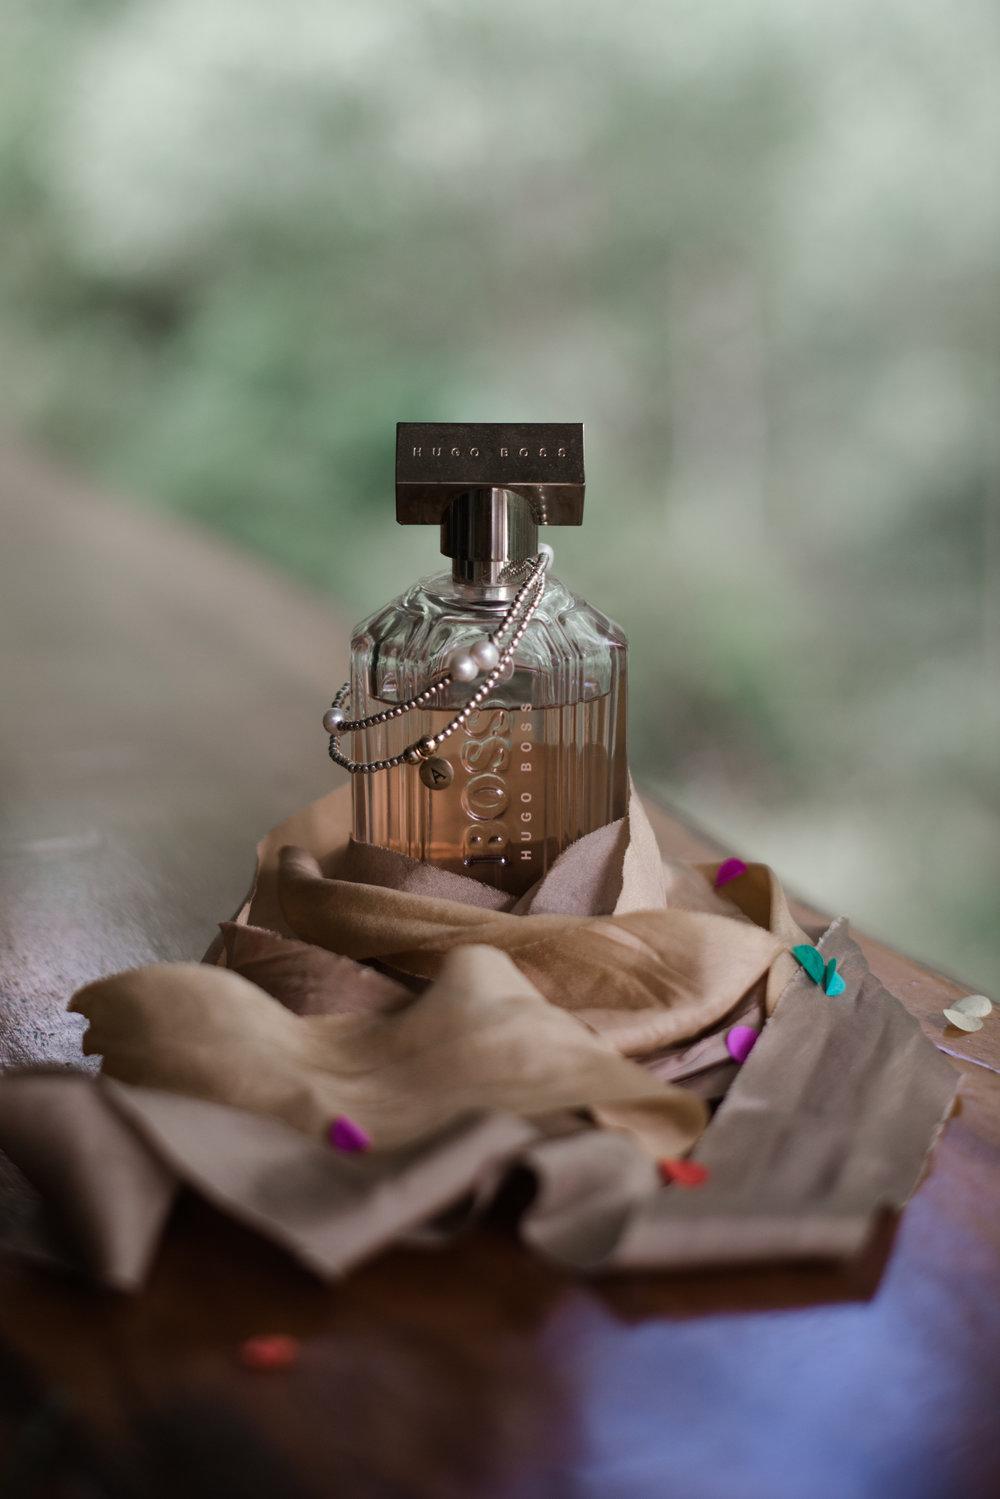 LOVELENSCAPES PHOTOGRAPHY •VISUAL POETRY • GLASSHOUSE MOUNTAINS • AUSTRALIAN WEDDING PHOTOGRAPHER • SUNSHINE COAST WEDDING PHOTOGRAPHER • LUV BRIDAL • BEERWAH HIDEAWAY • 29.jpg